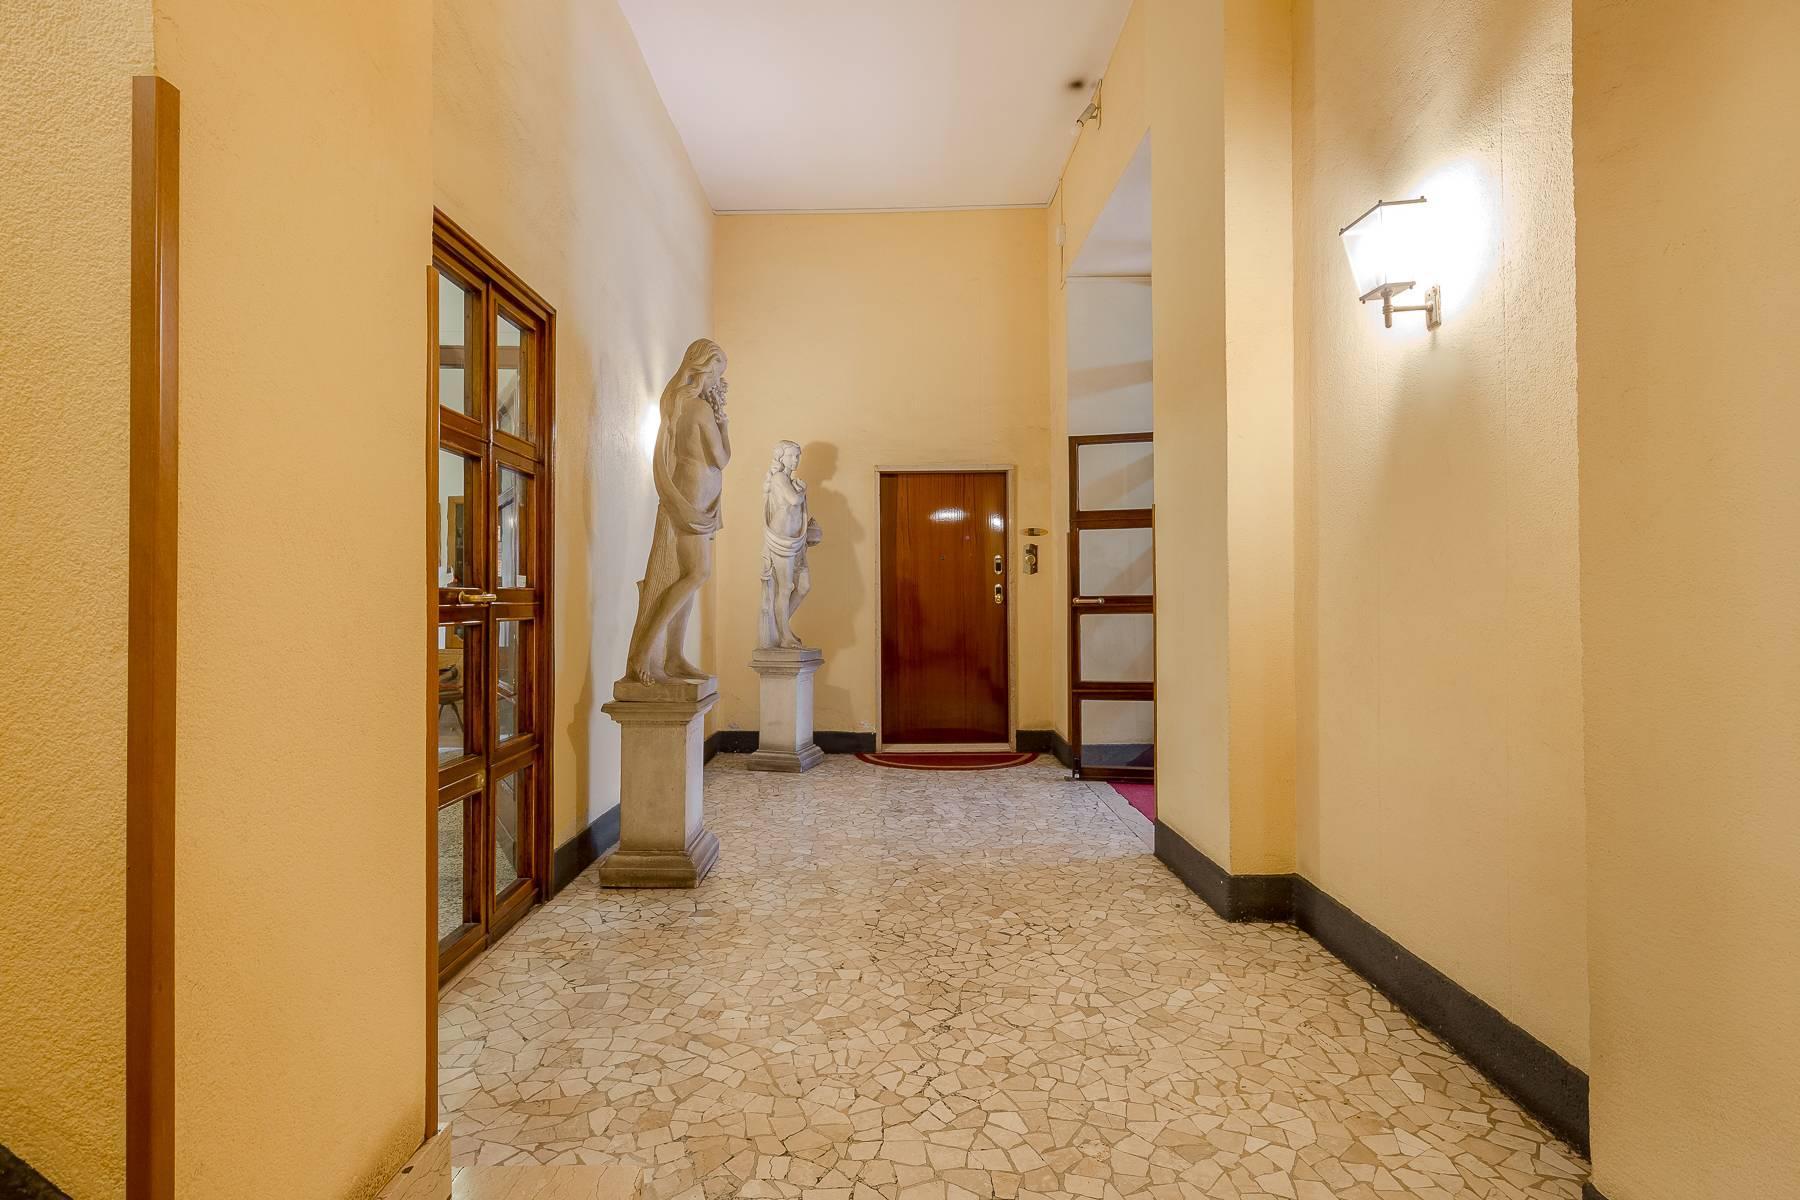 Open space office/residential property in Piazza Giovine Italia/Via Aurelio Saffi - 2